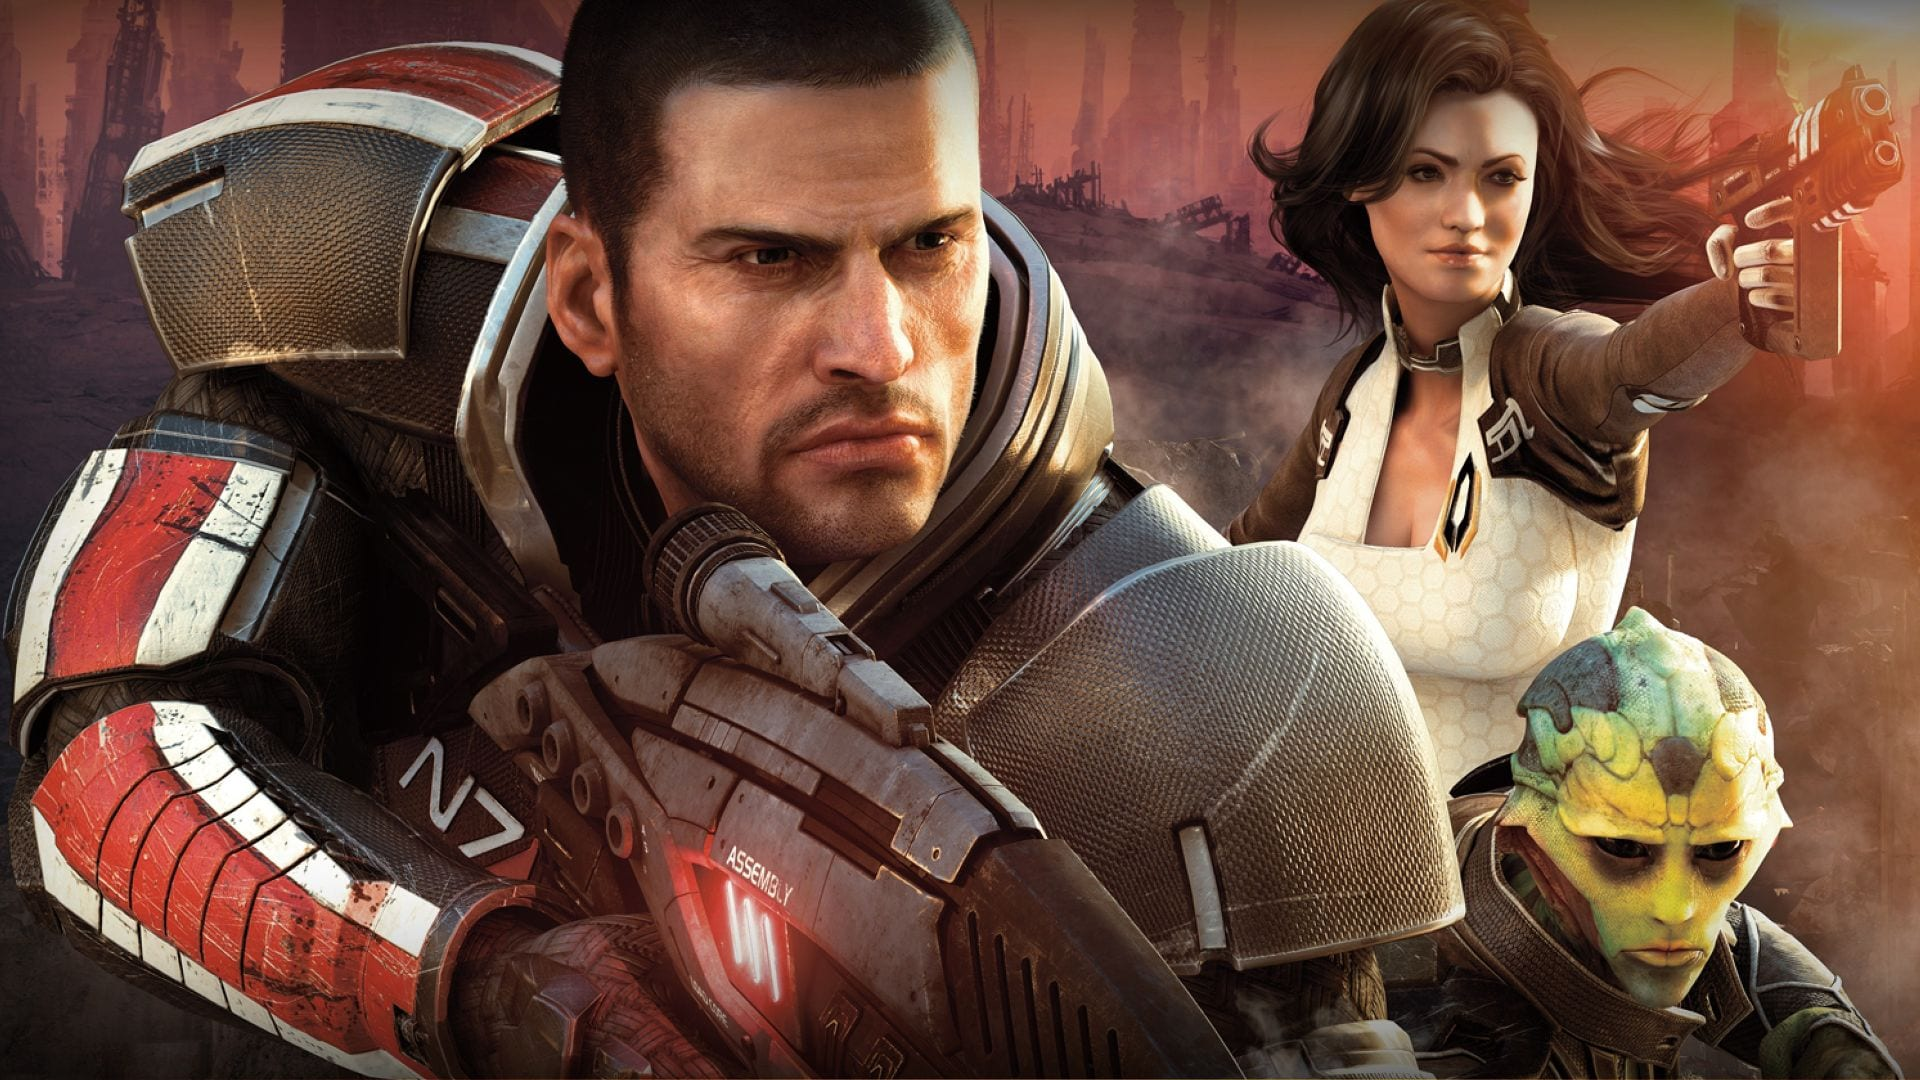 Mass Effect 2 Gratis su Origin - I DLC di Mass Effect 2 e 3 sono ora acquistabili su Origin